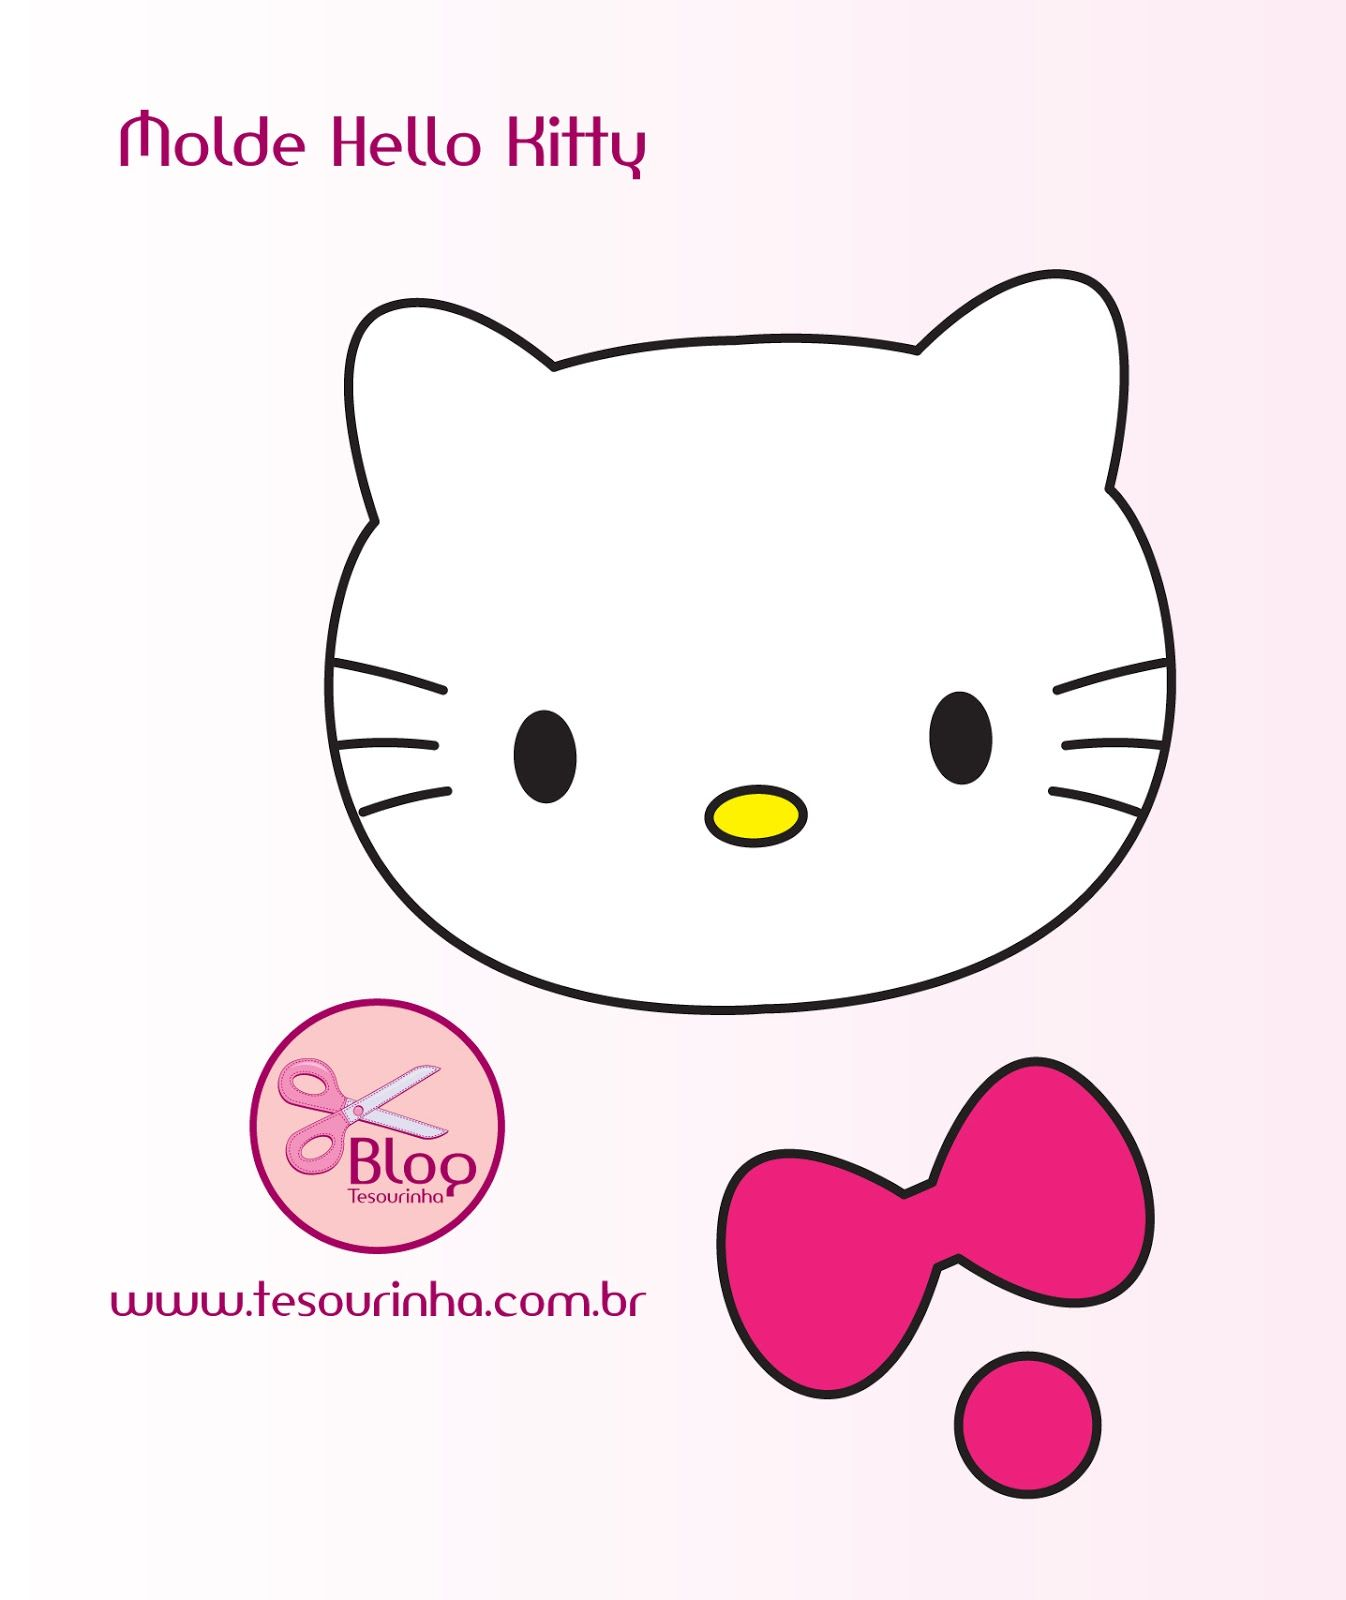 moldes de fieltro | Kitty, Hello kitty and Molde